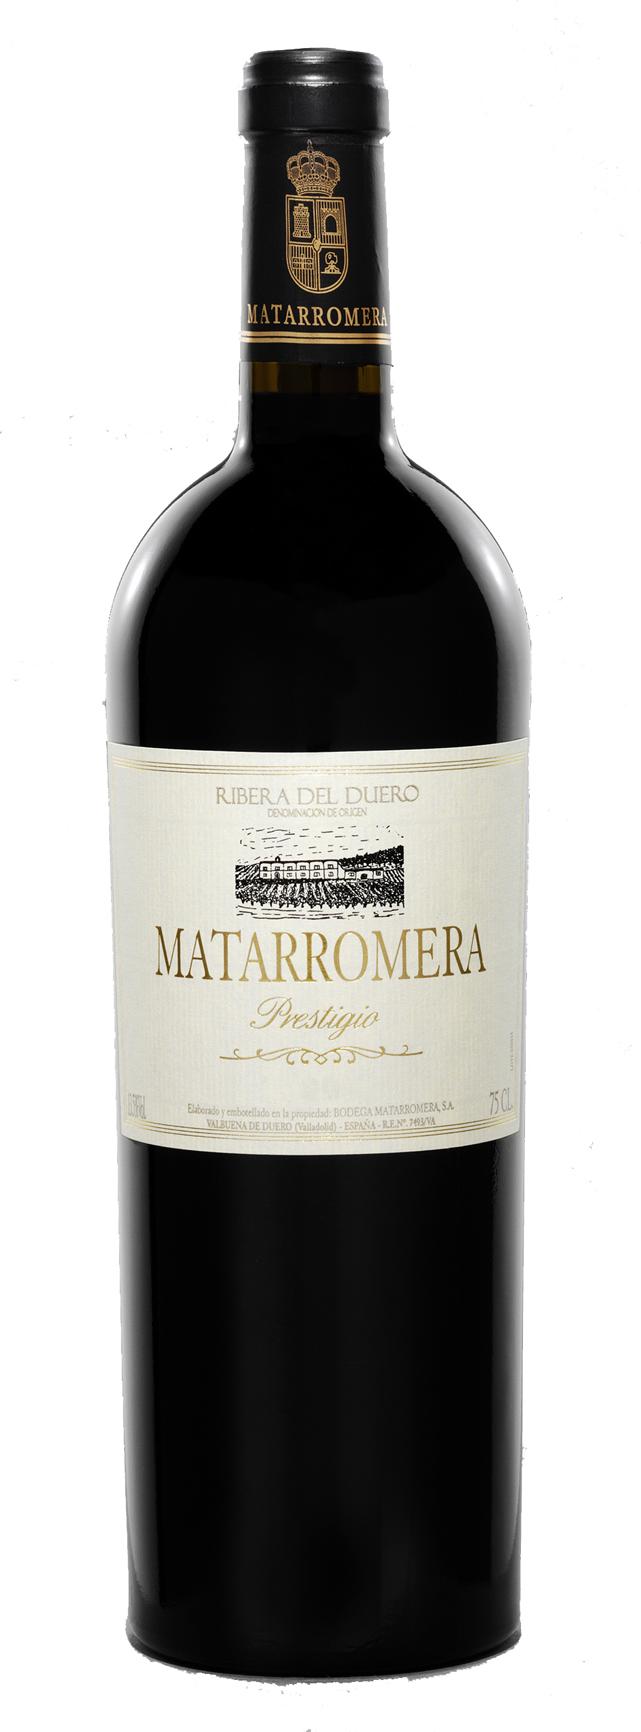 Matarromera Prestigio, un valor seguro para Wine Enthusiast